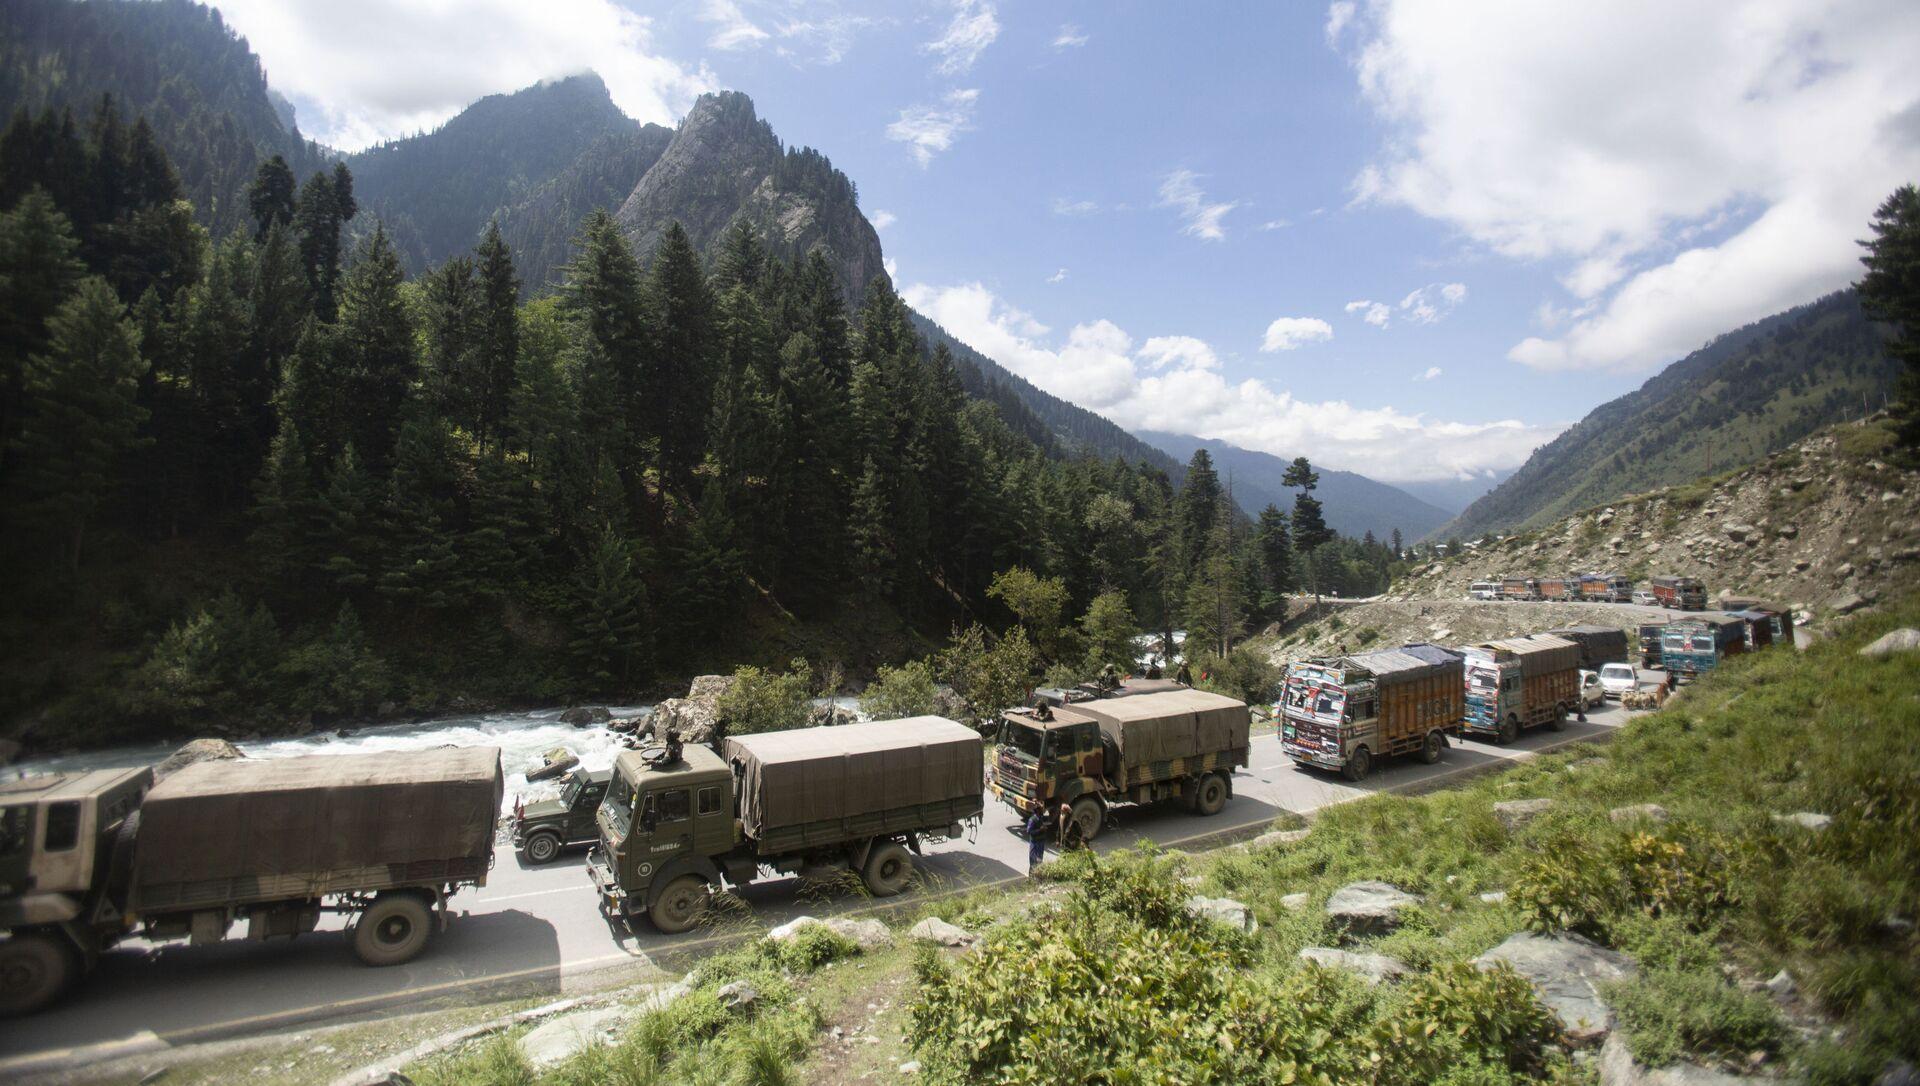 An Indian army convoy moves on the Srinagar- Ladakh highway at Gagangeer, northeast of Srinagar, Indian-controlled Kashmir, Tuesday, Sept. 1, 2020 - Sputnik International, 1920, 24.06.2021